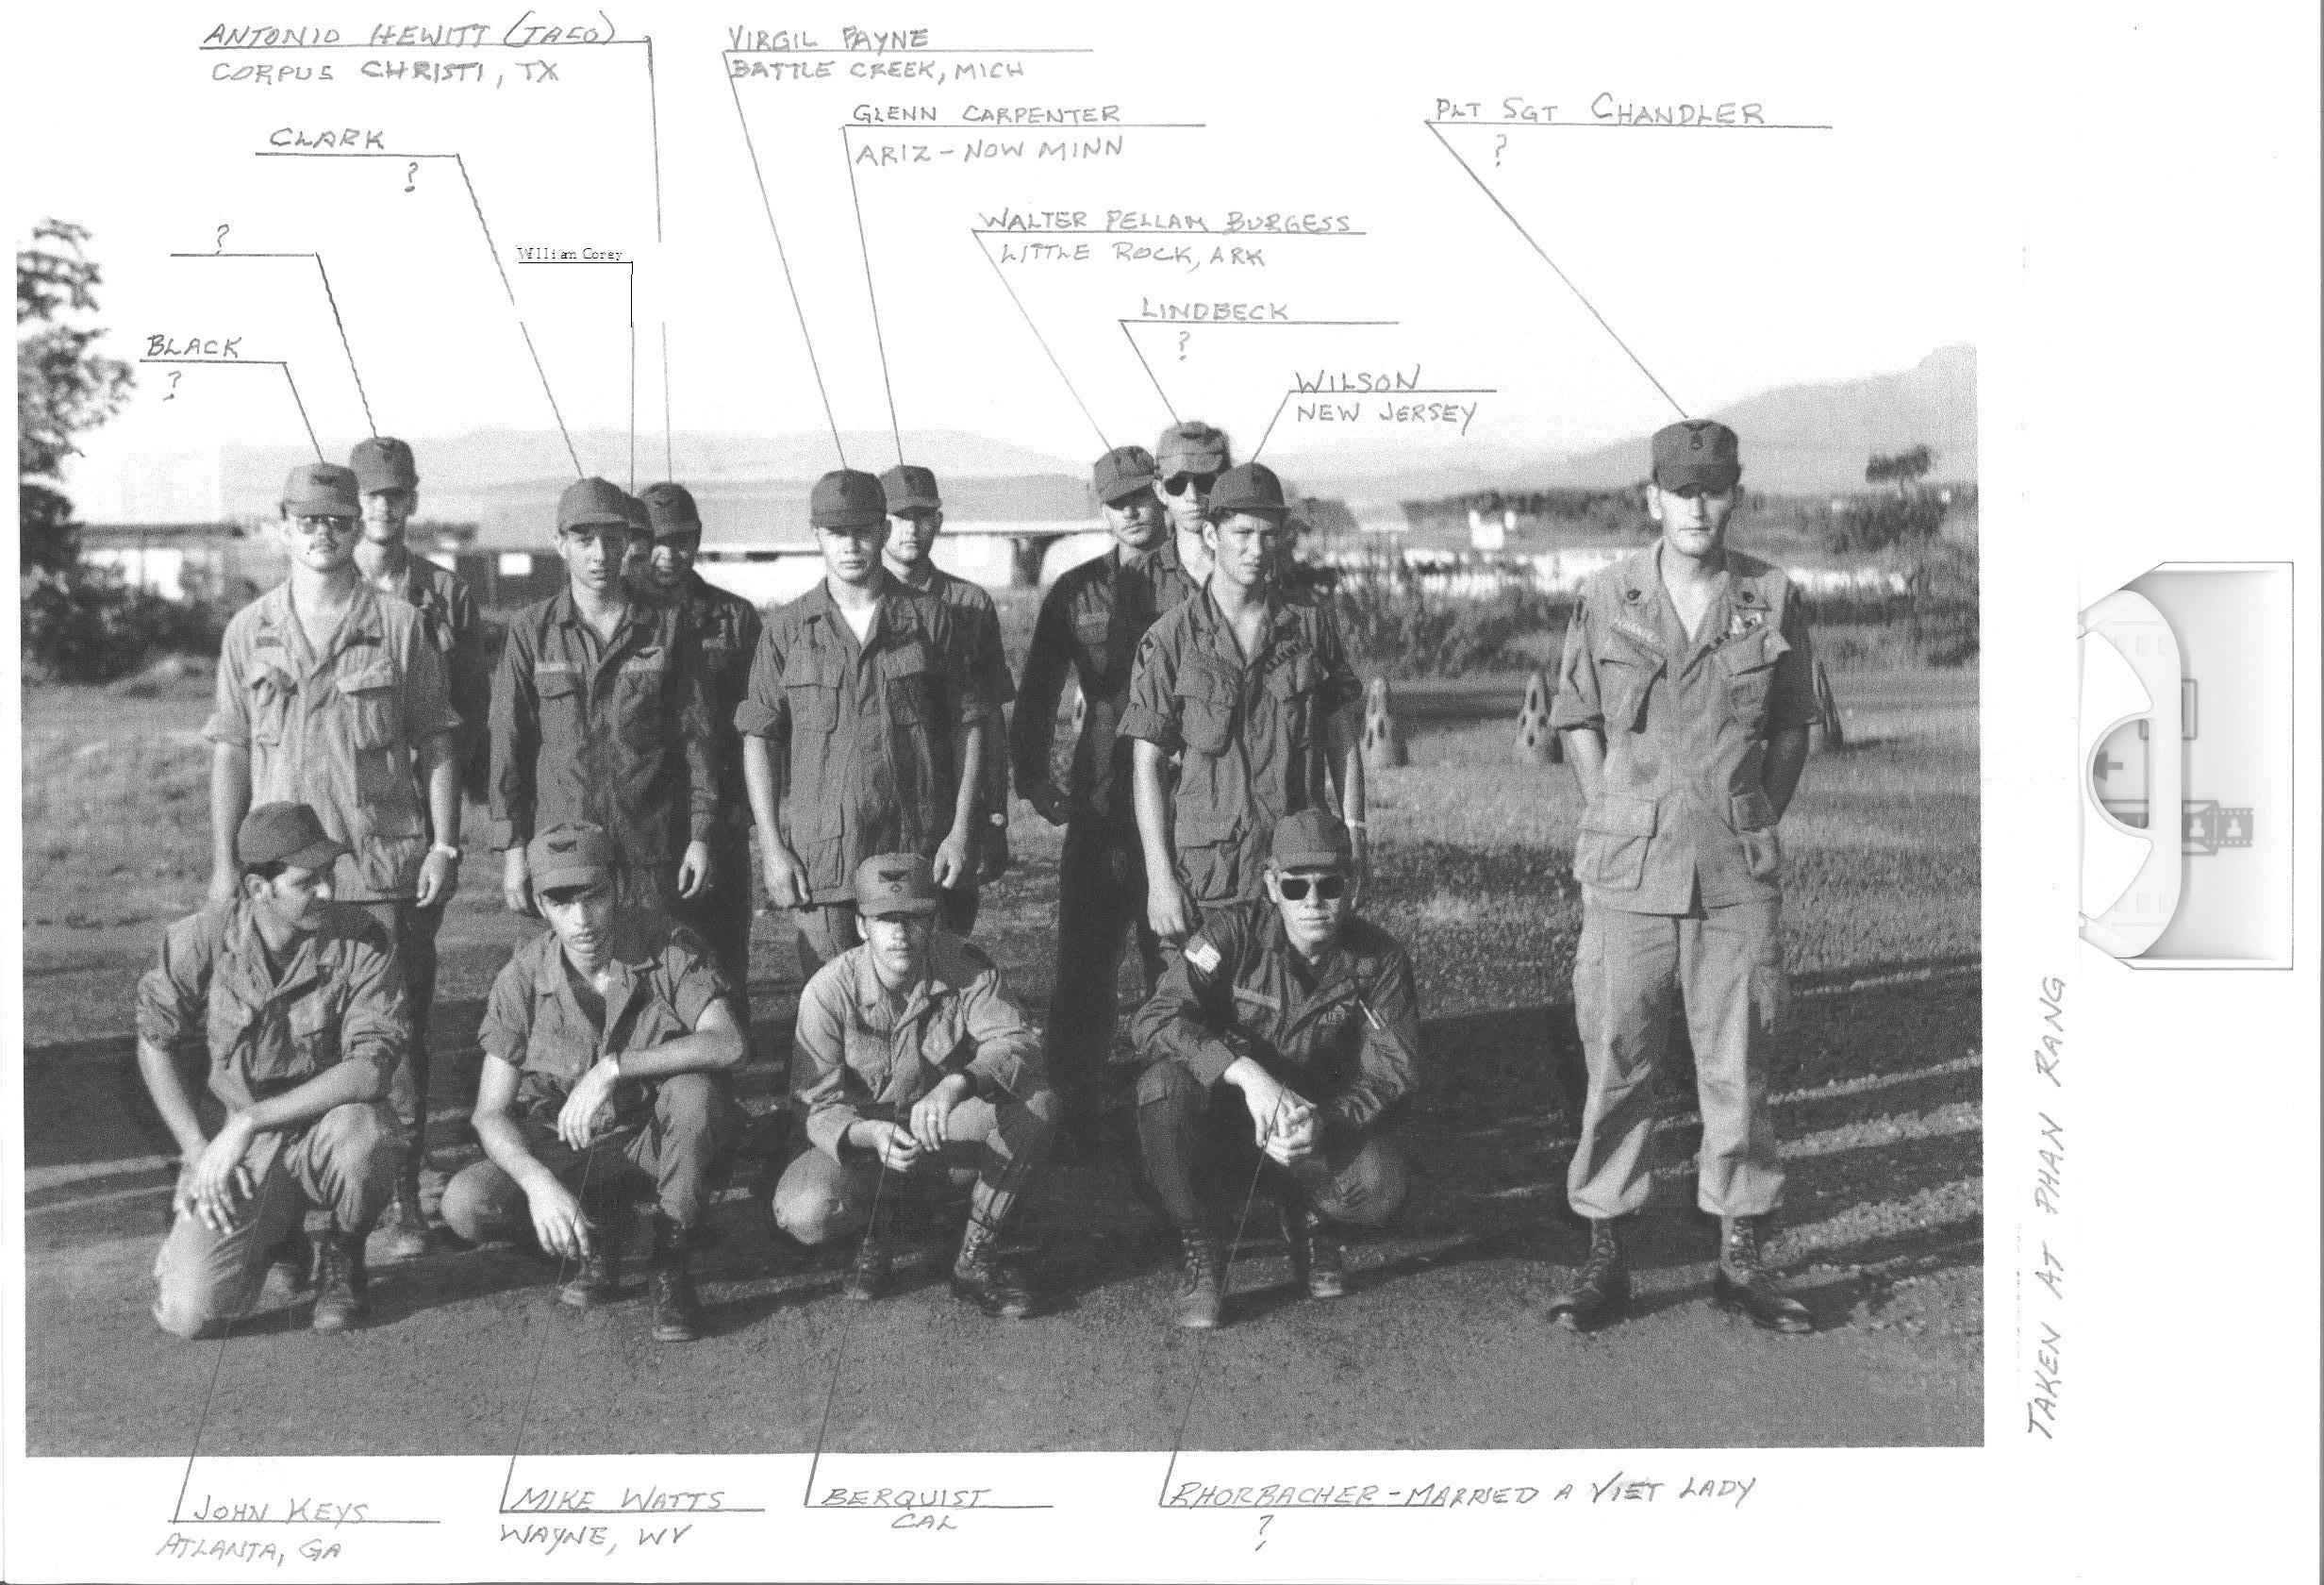 Gunners-Crew-Chiefs-Phan-Rang-1971-by-Mike-Watts